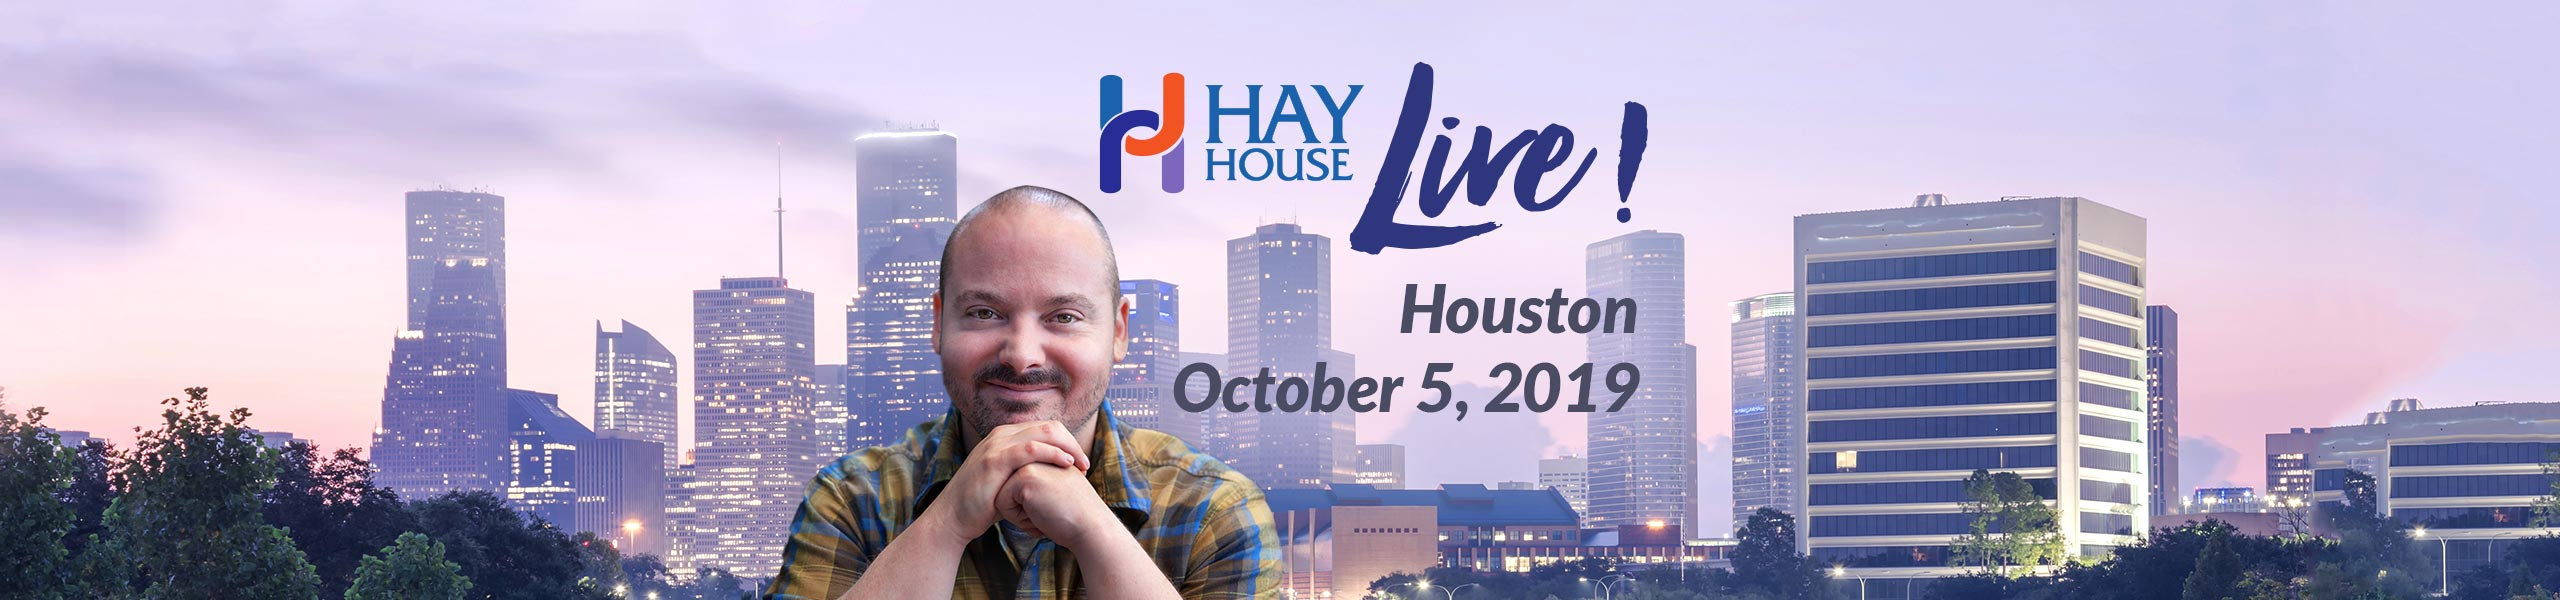 Hay House Live! Houston 2019 - Matt Kahn